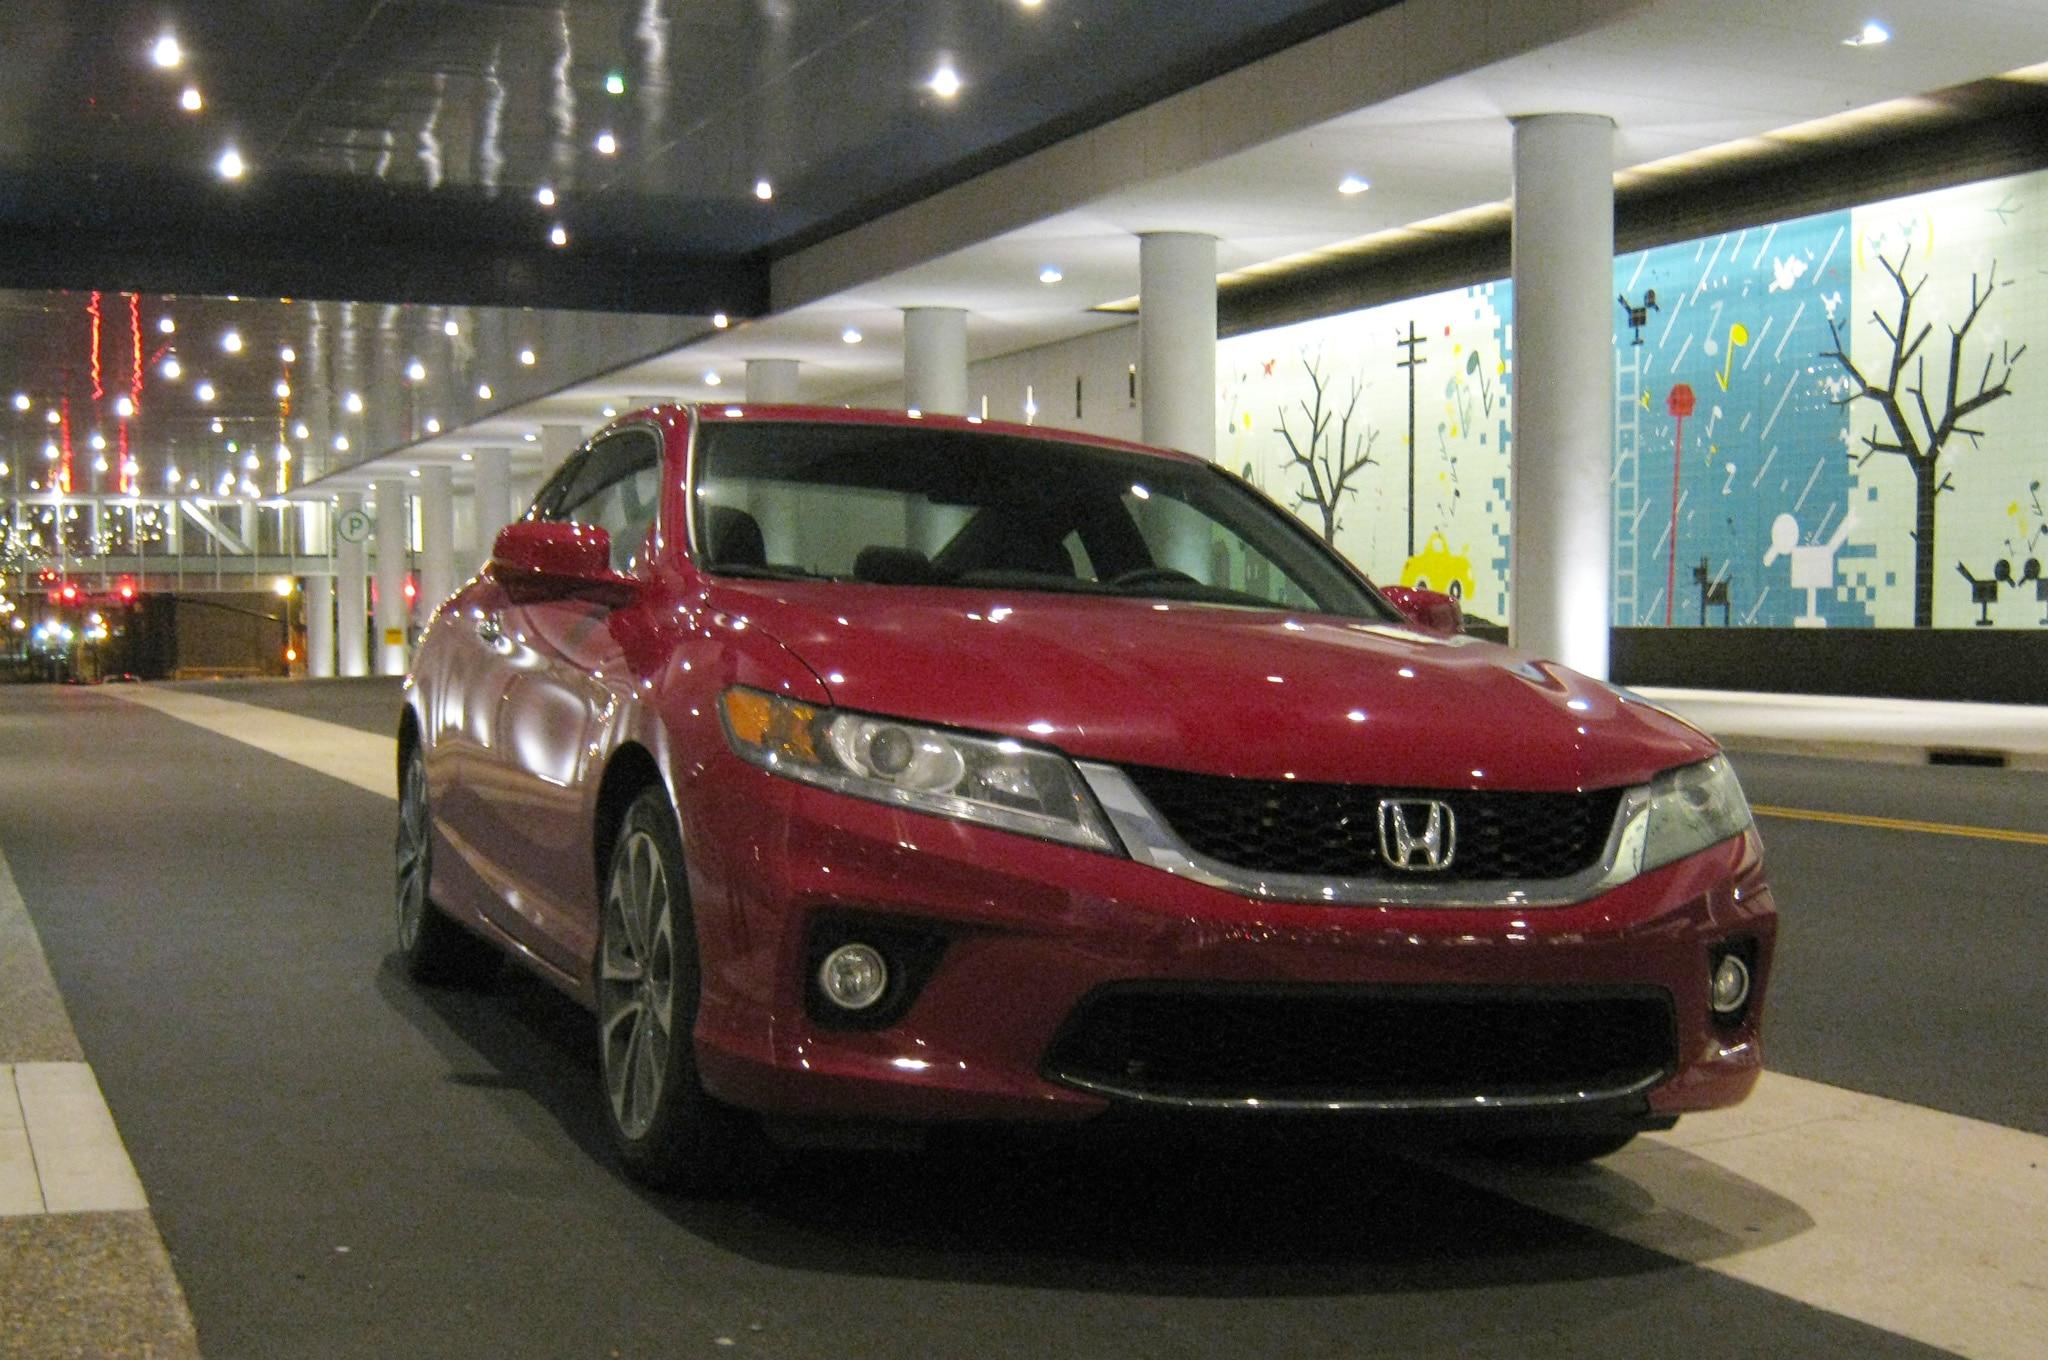 2014 Honda Accord EX-L V-6 Coupe - Four Seasons Wrap-Up